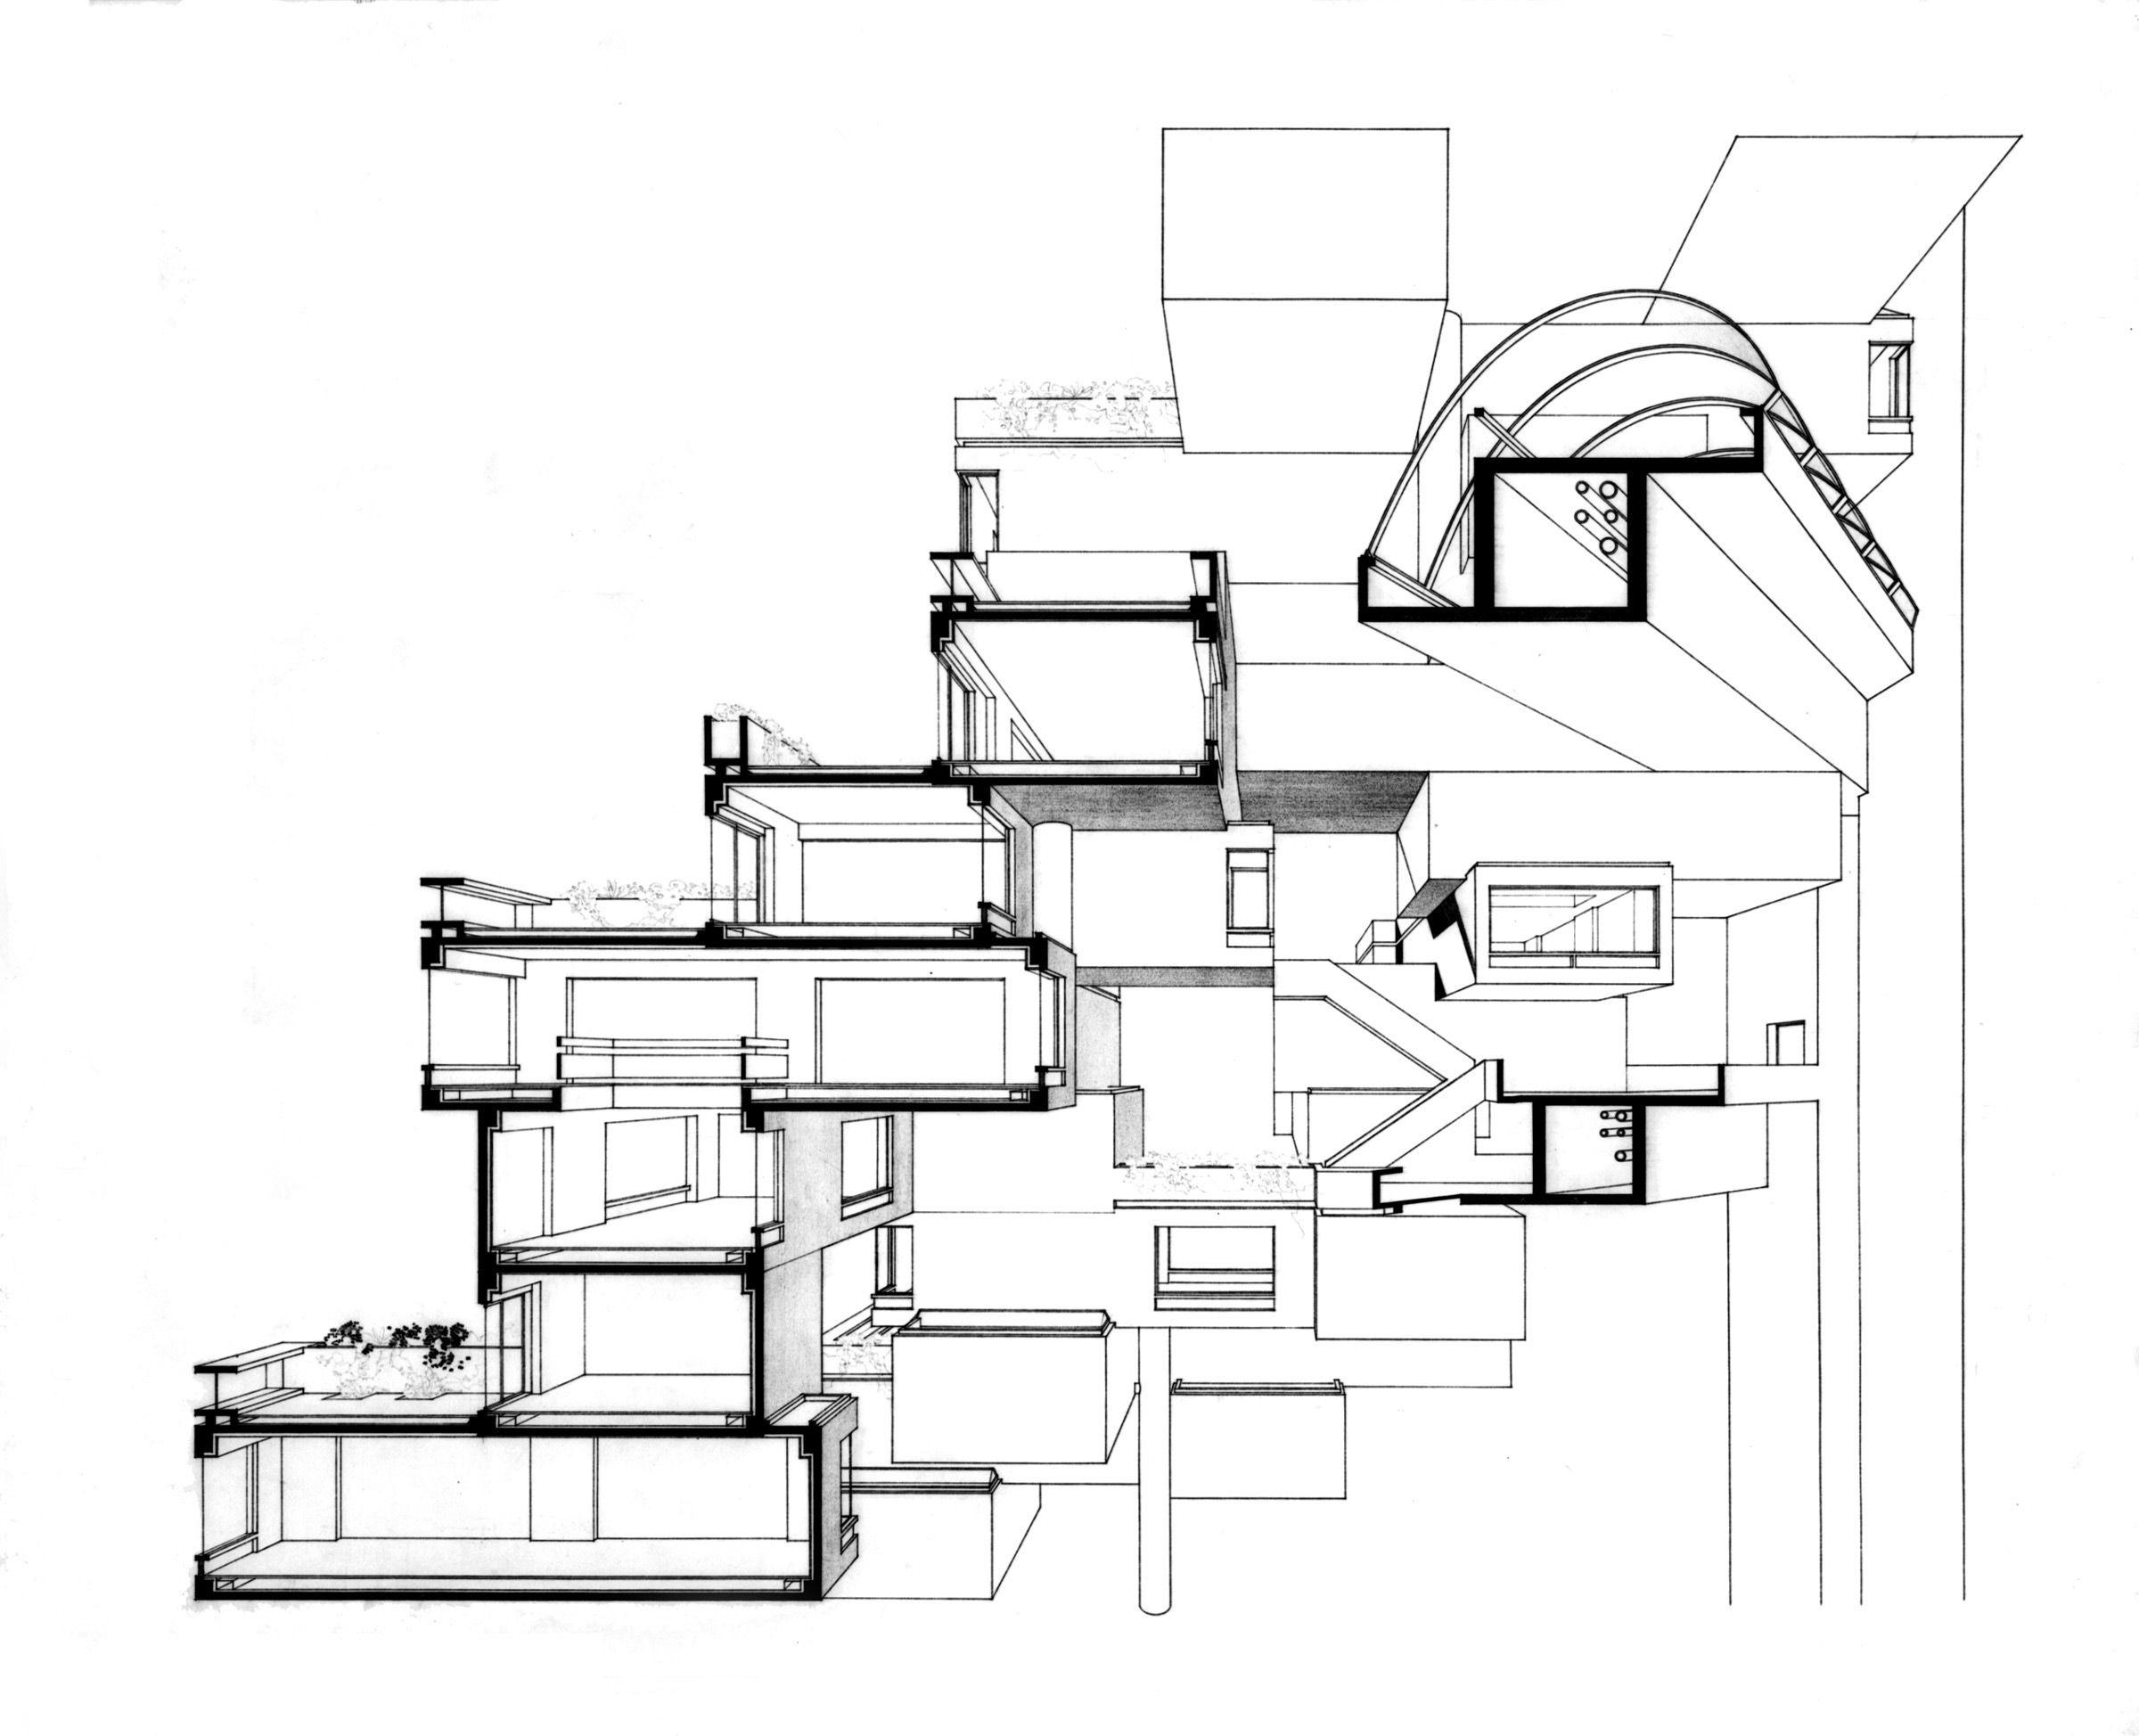 Habitat 67 pinterest architecture concept diagram and architecture ccuart Gallery